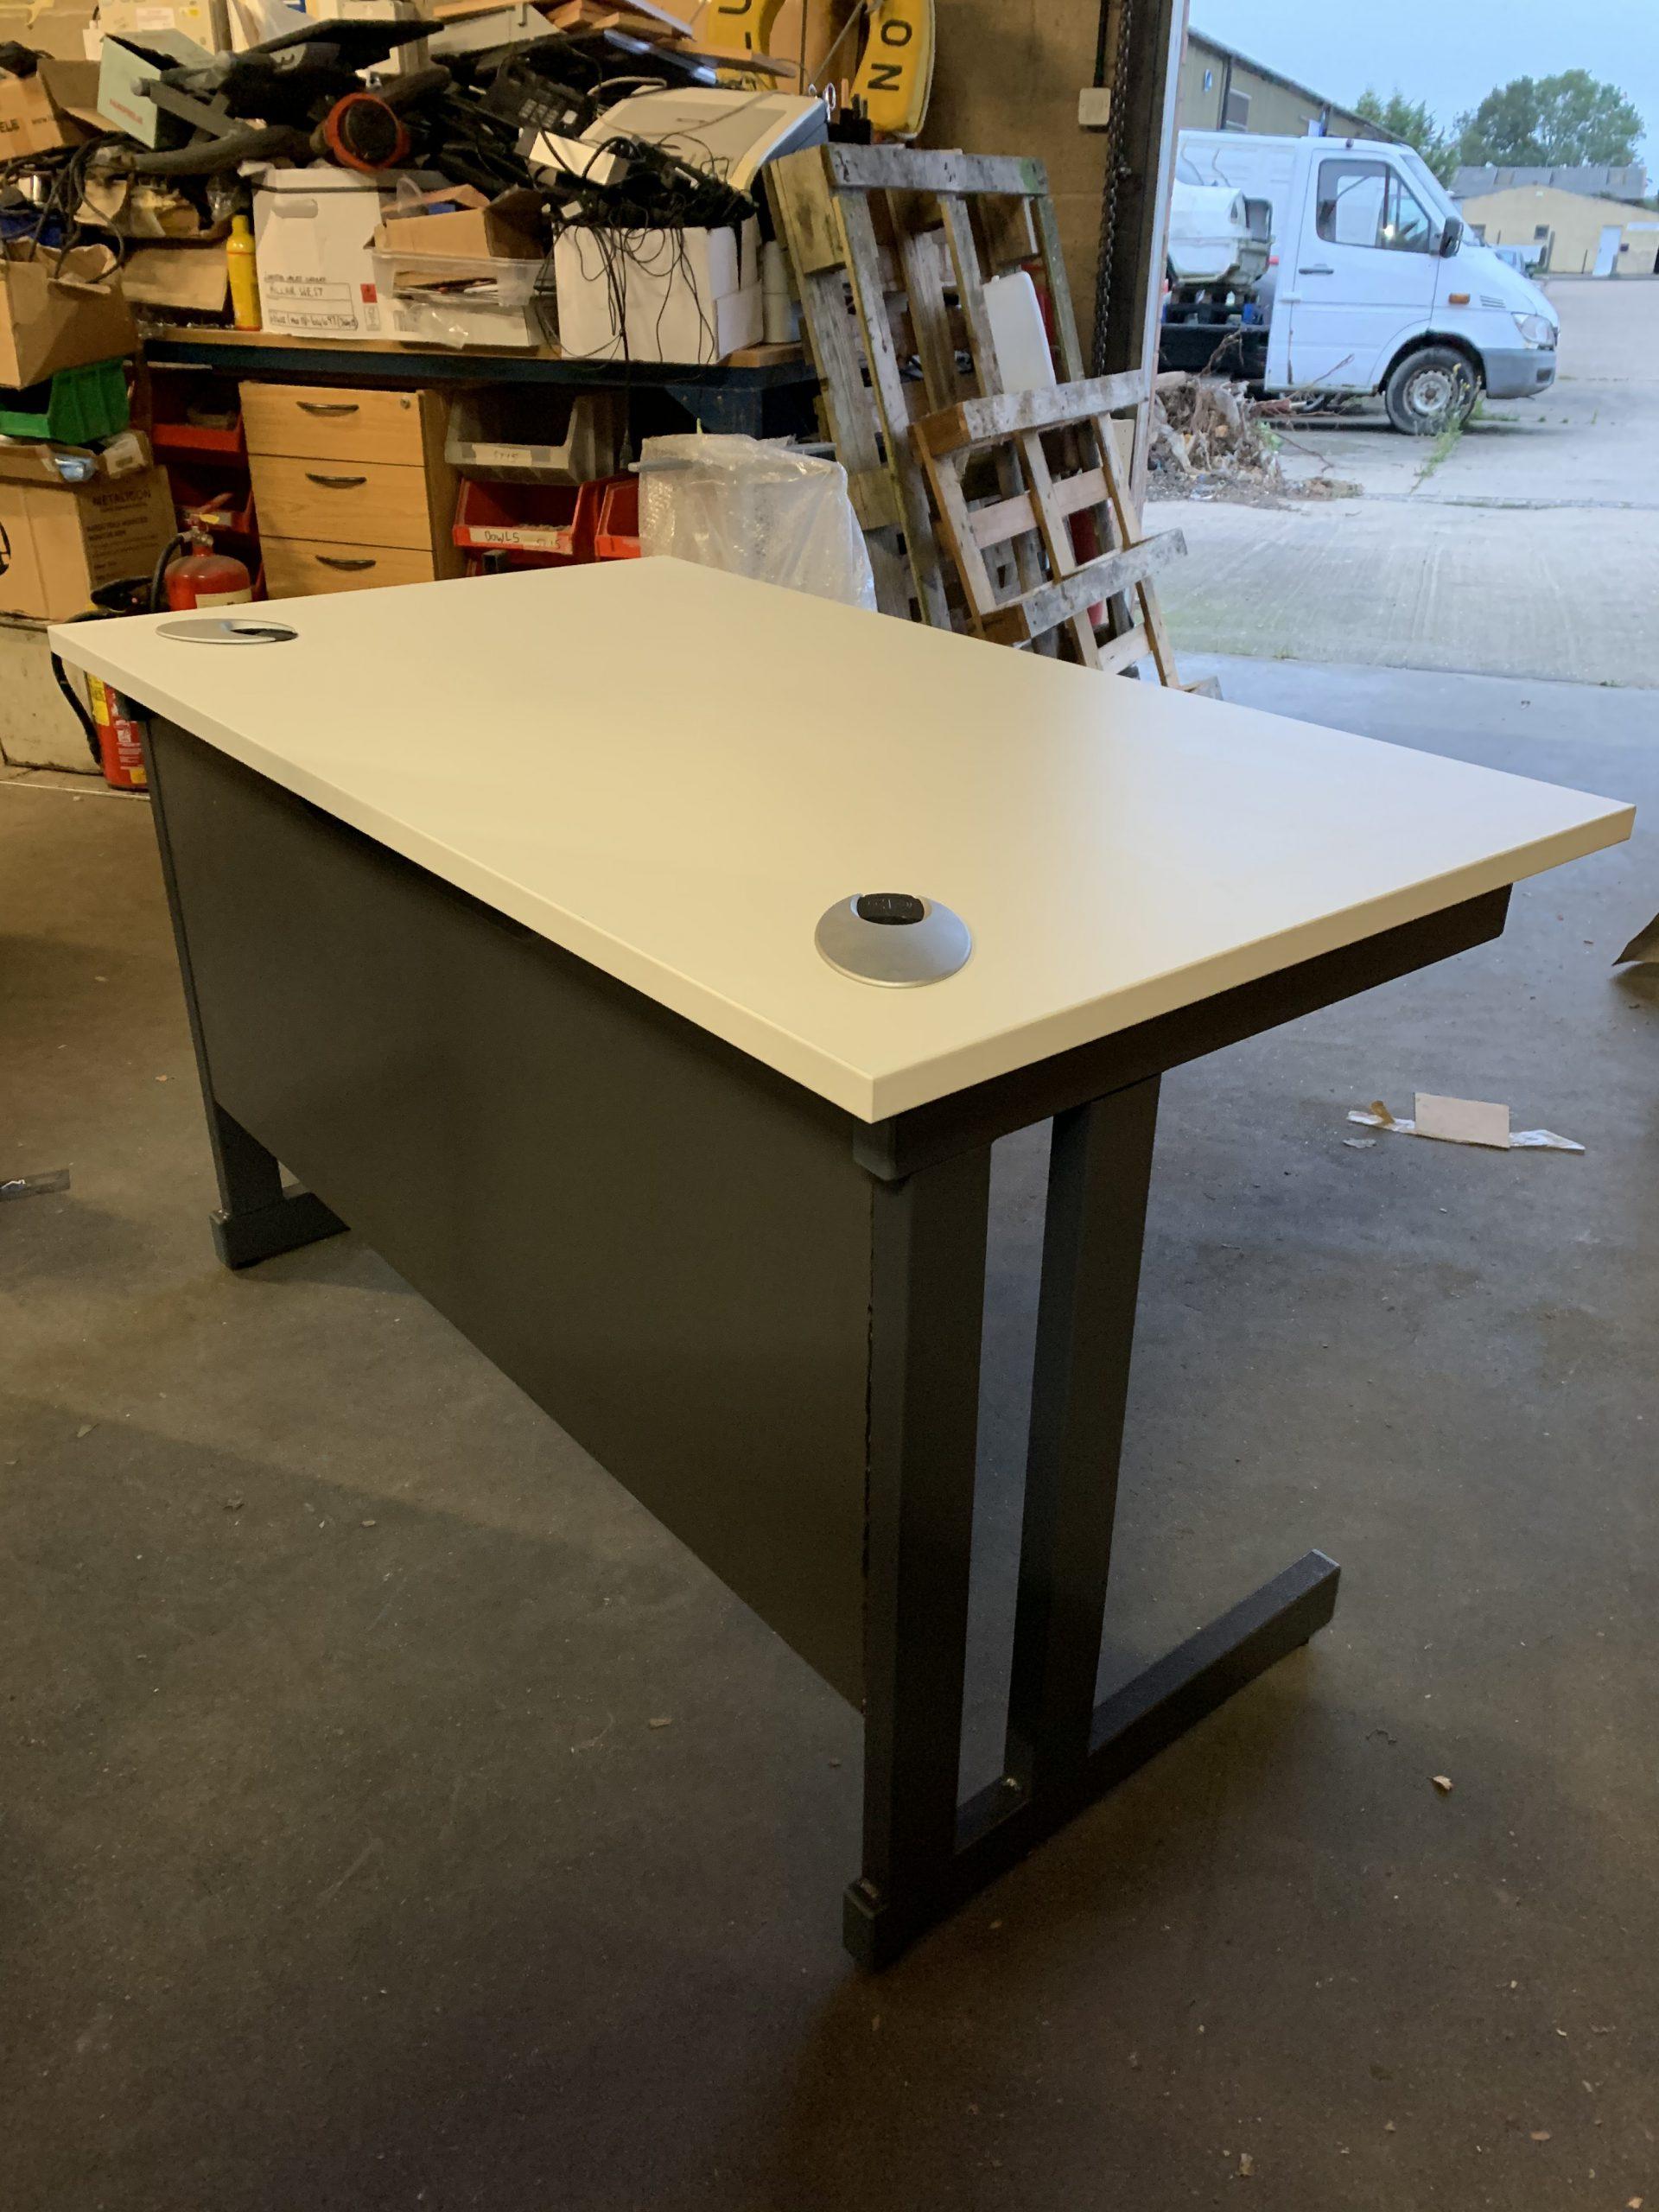 D51 1200mm X 700mm Home Office Desk White Desk Millarwest 2nd User Second Hand New Office Furniture